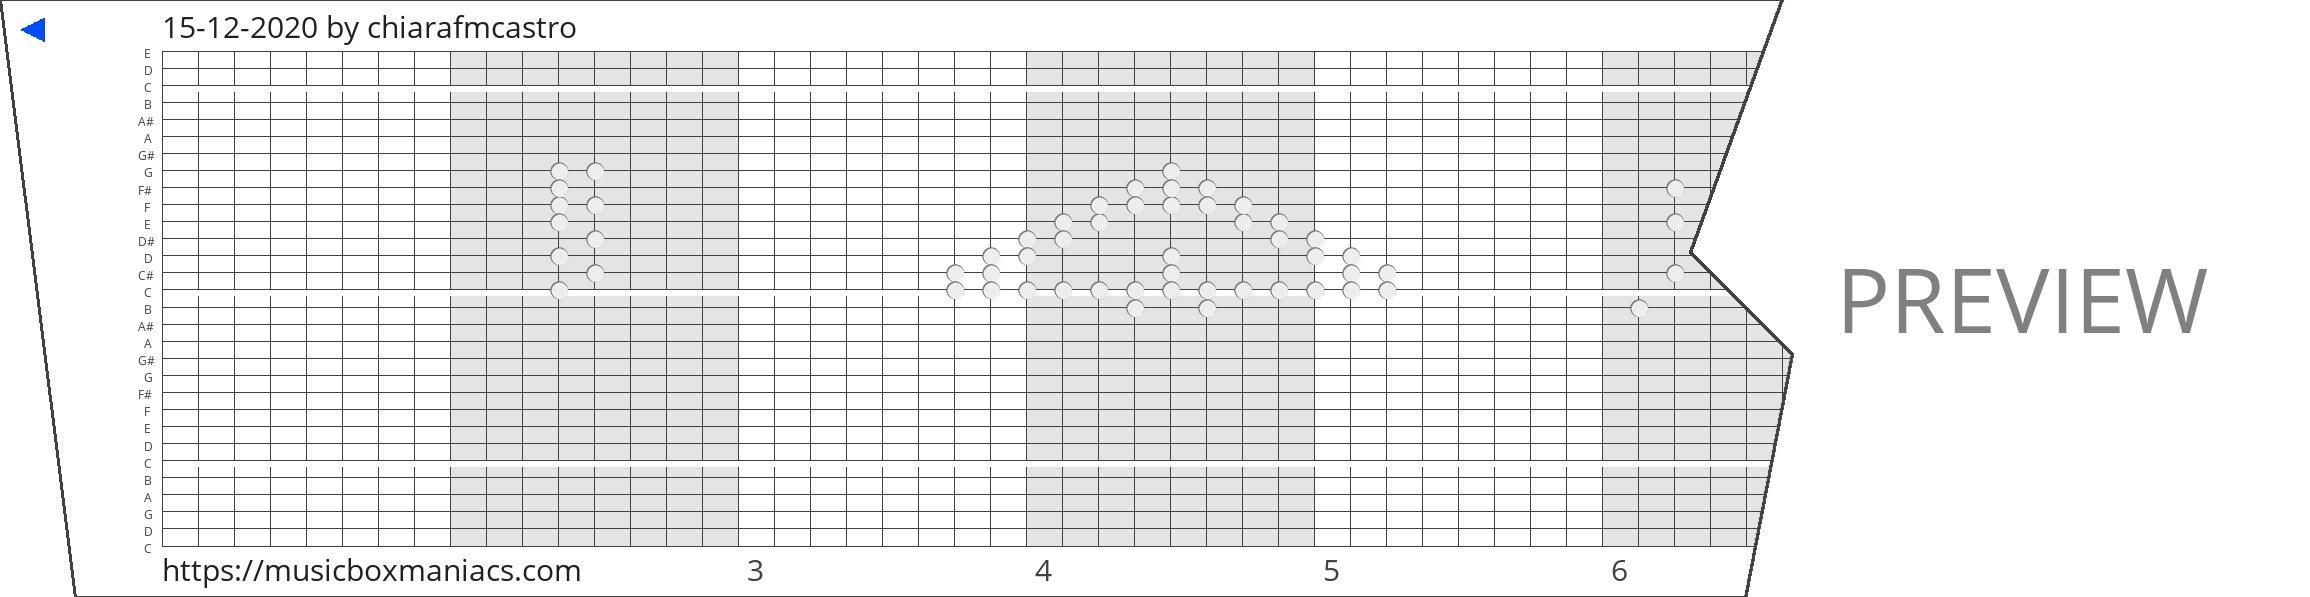 15-12-2020 30 note music box paper strip